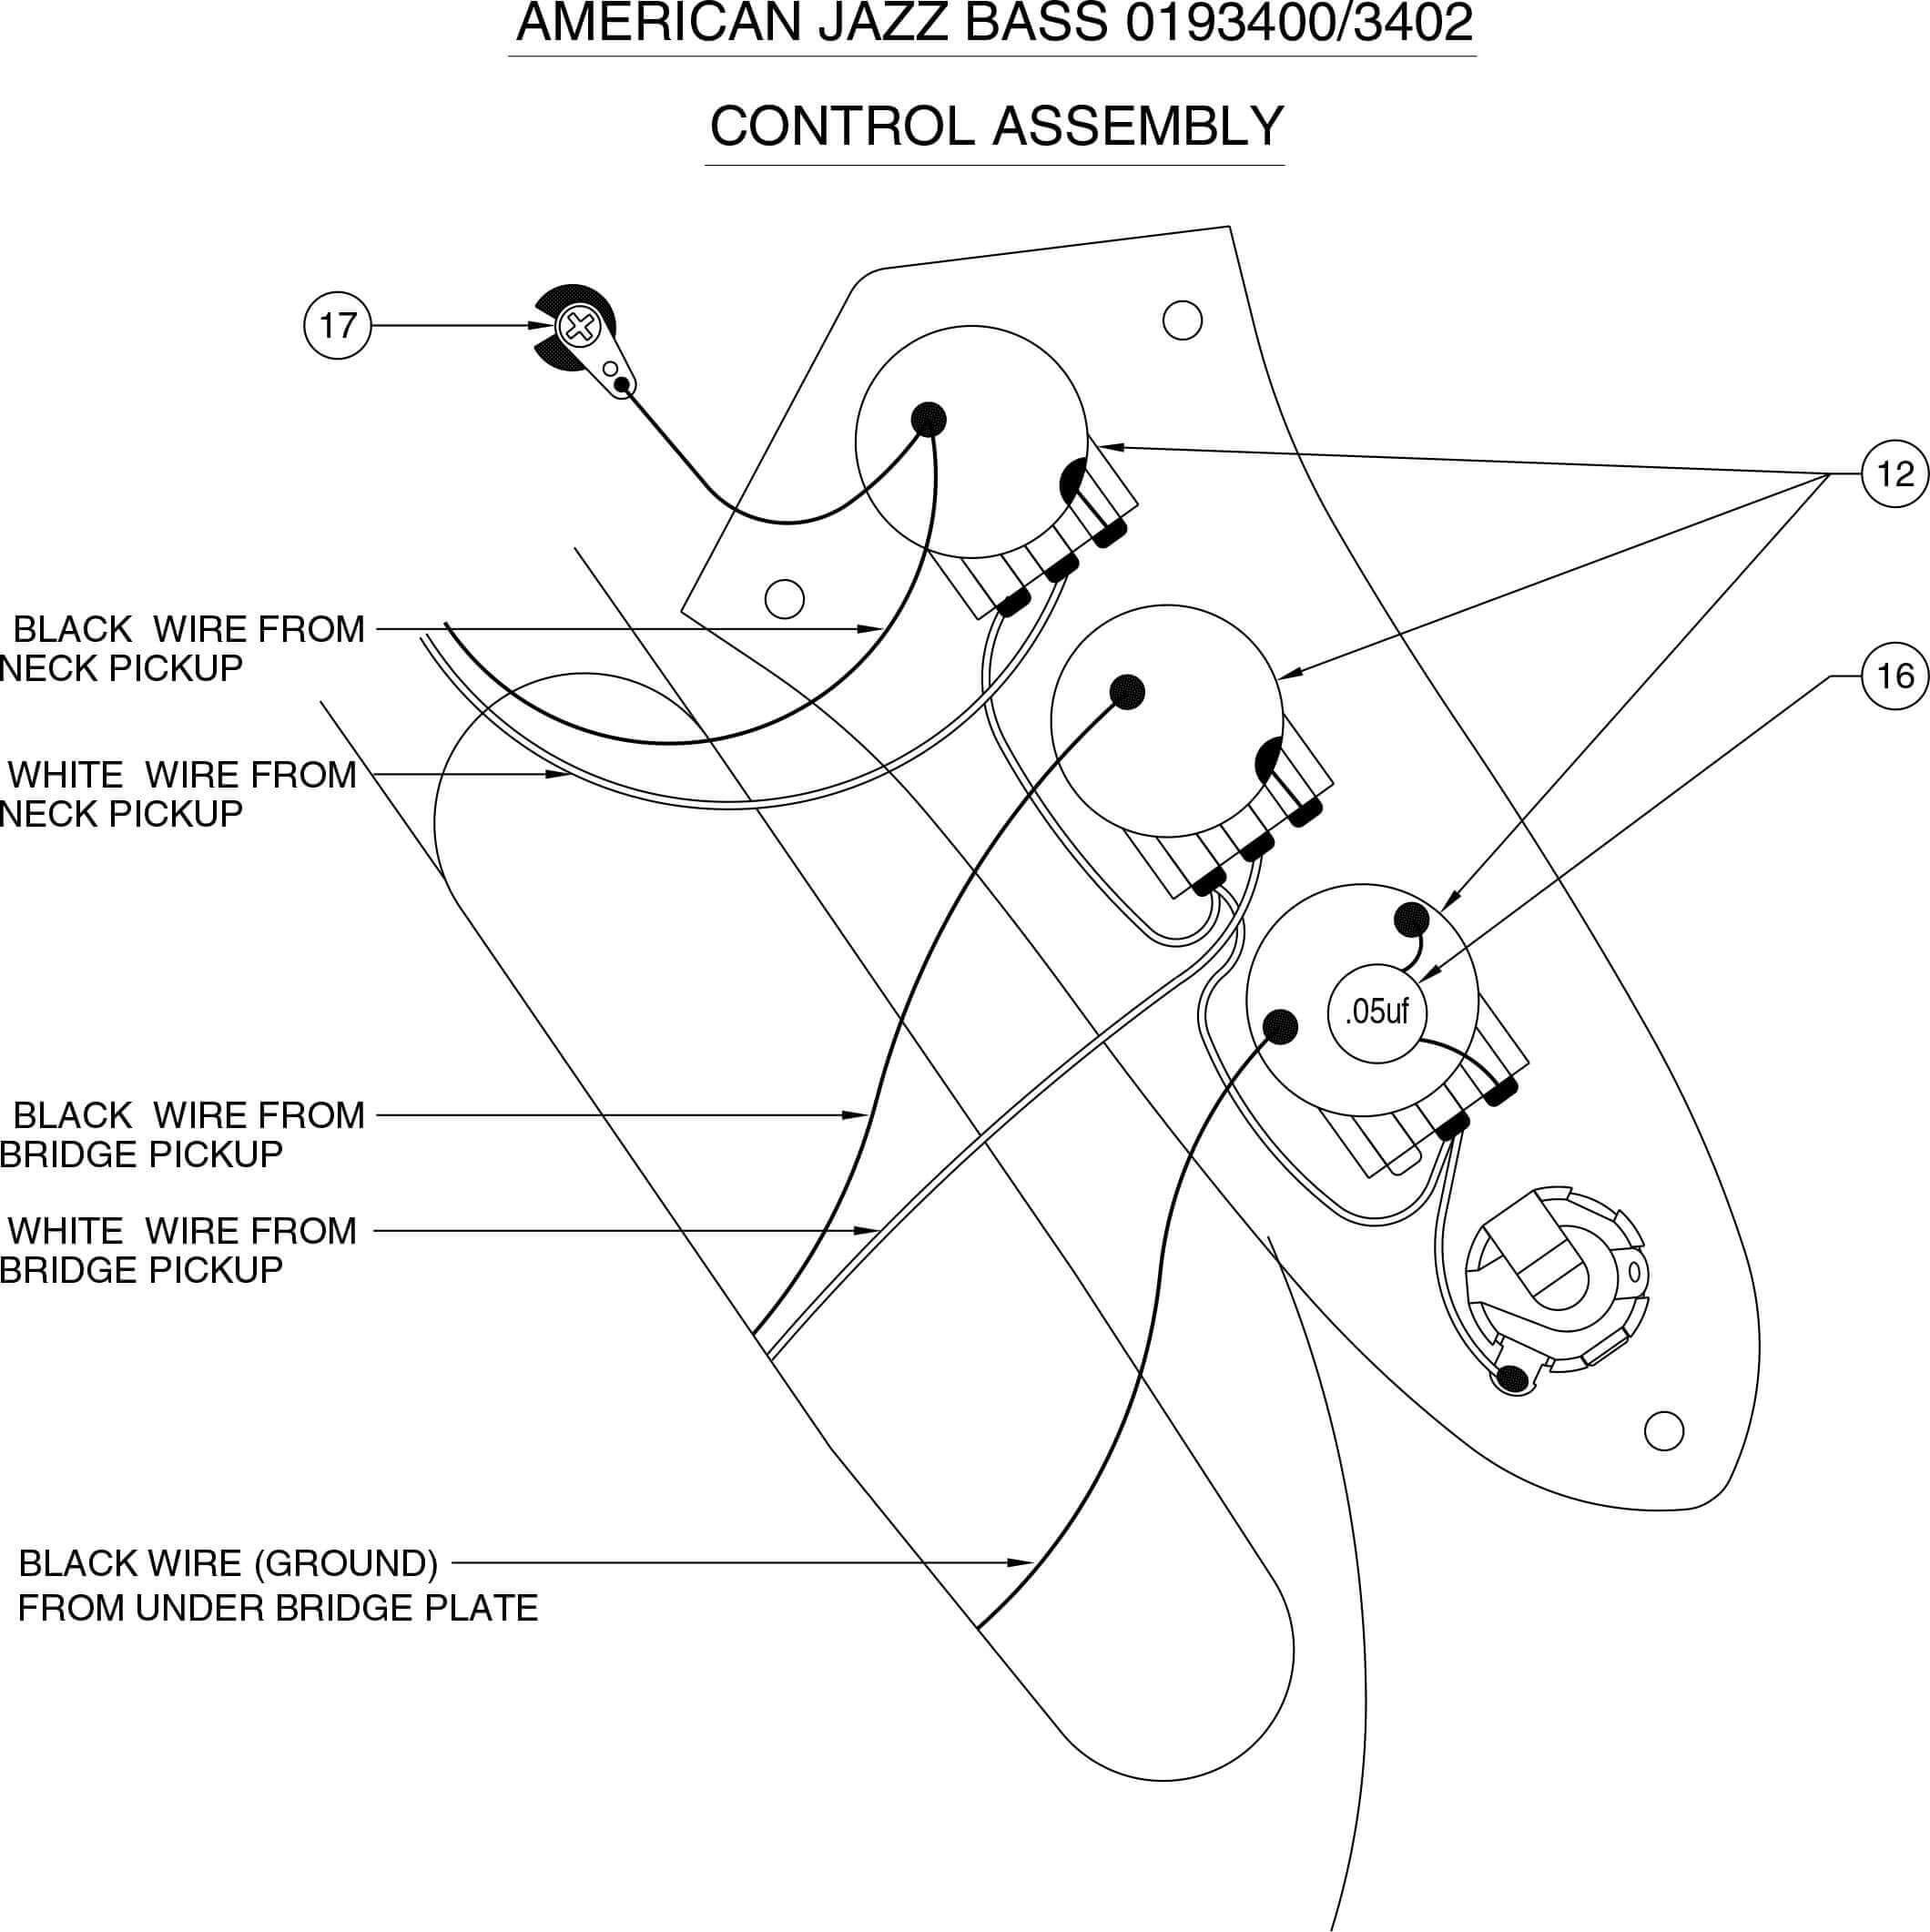 Schemi Elettrici In Pdf : Schemi elettrici dei bassi più famosi